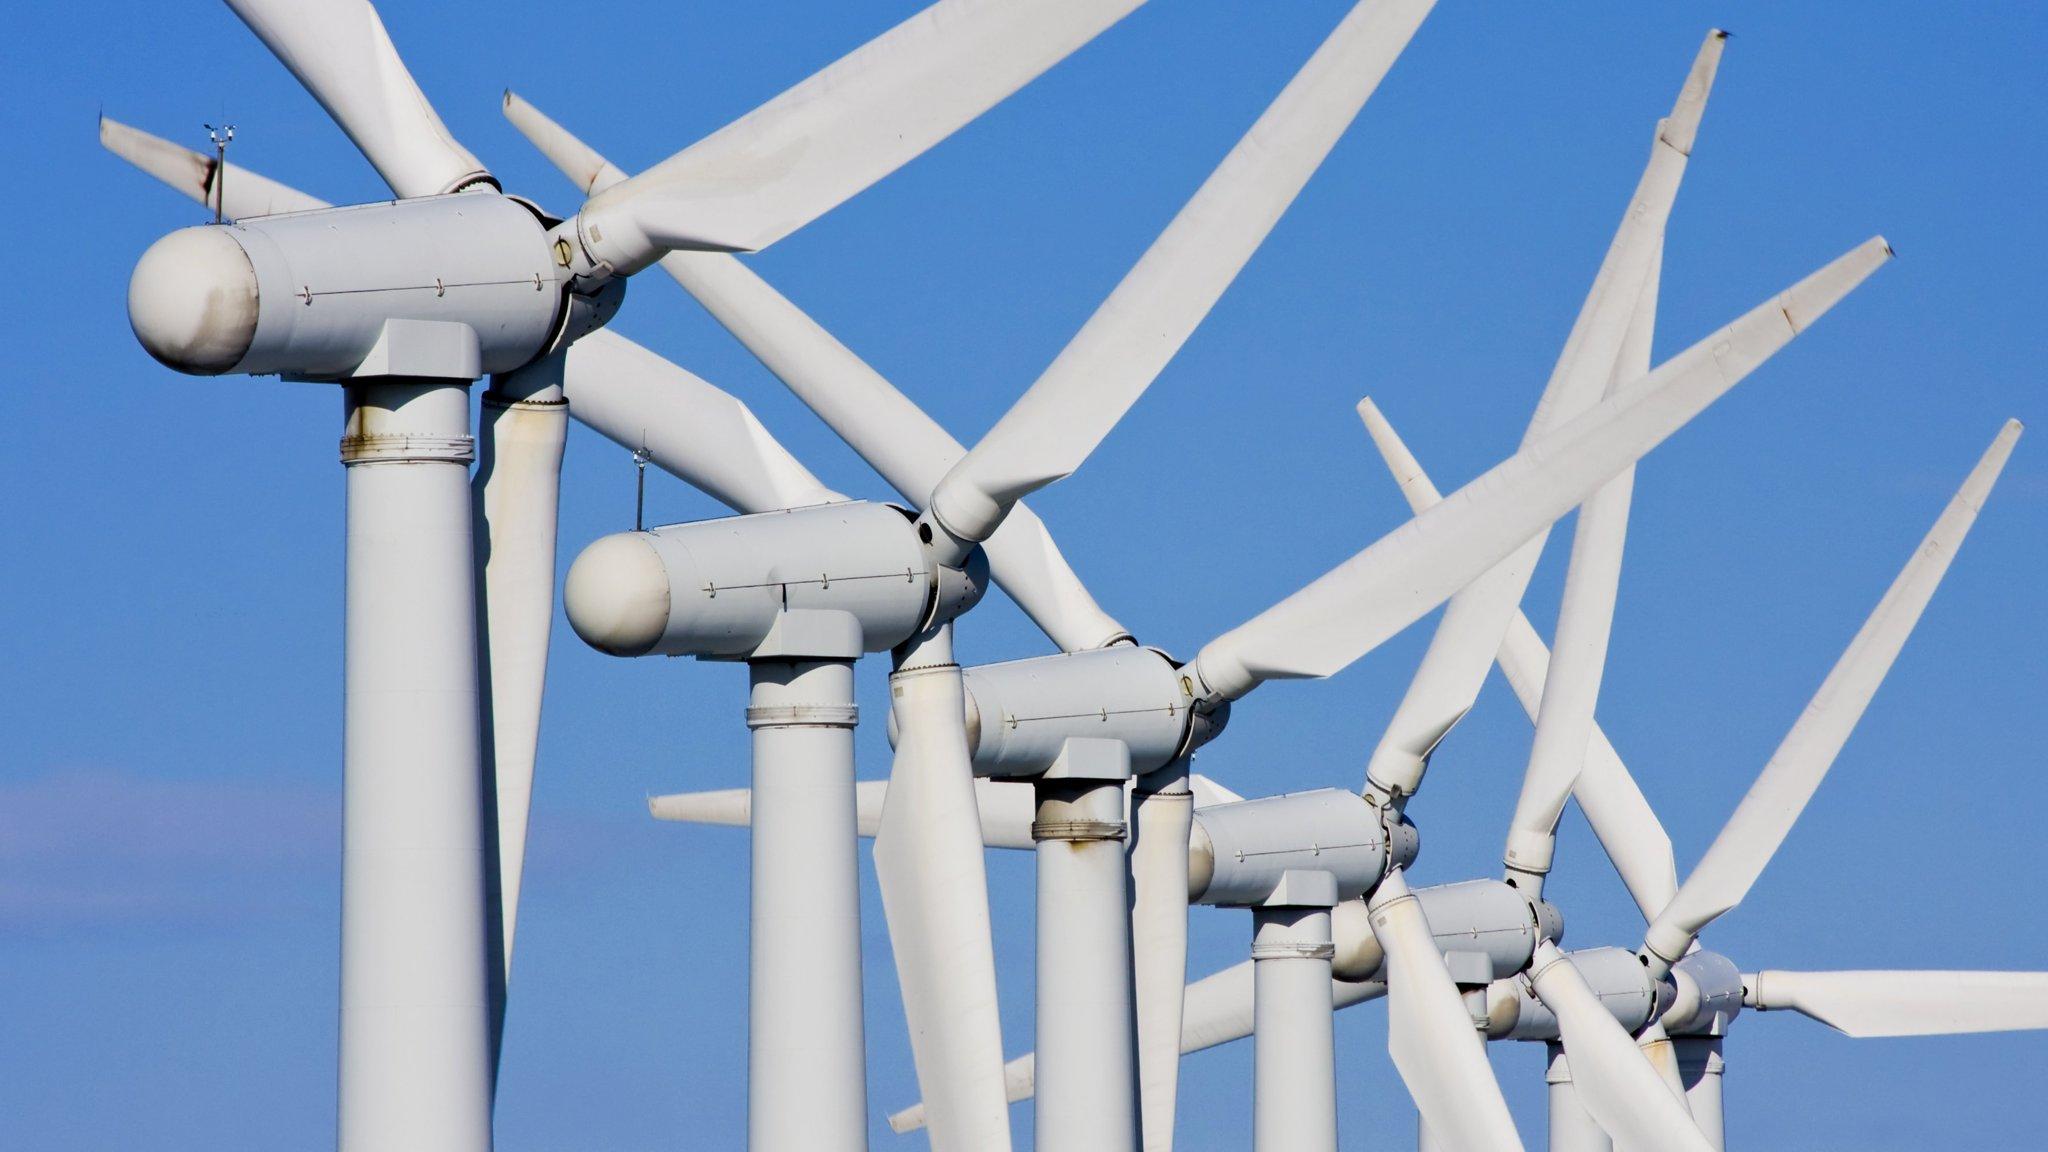 Siemens and Gamesa discuss wind power deal